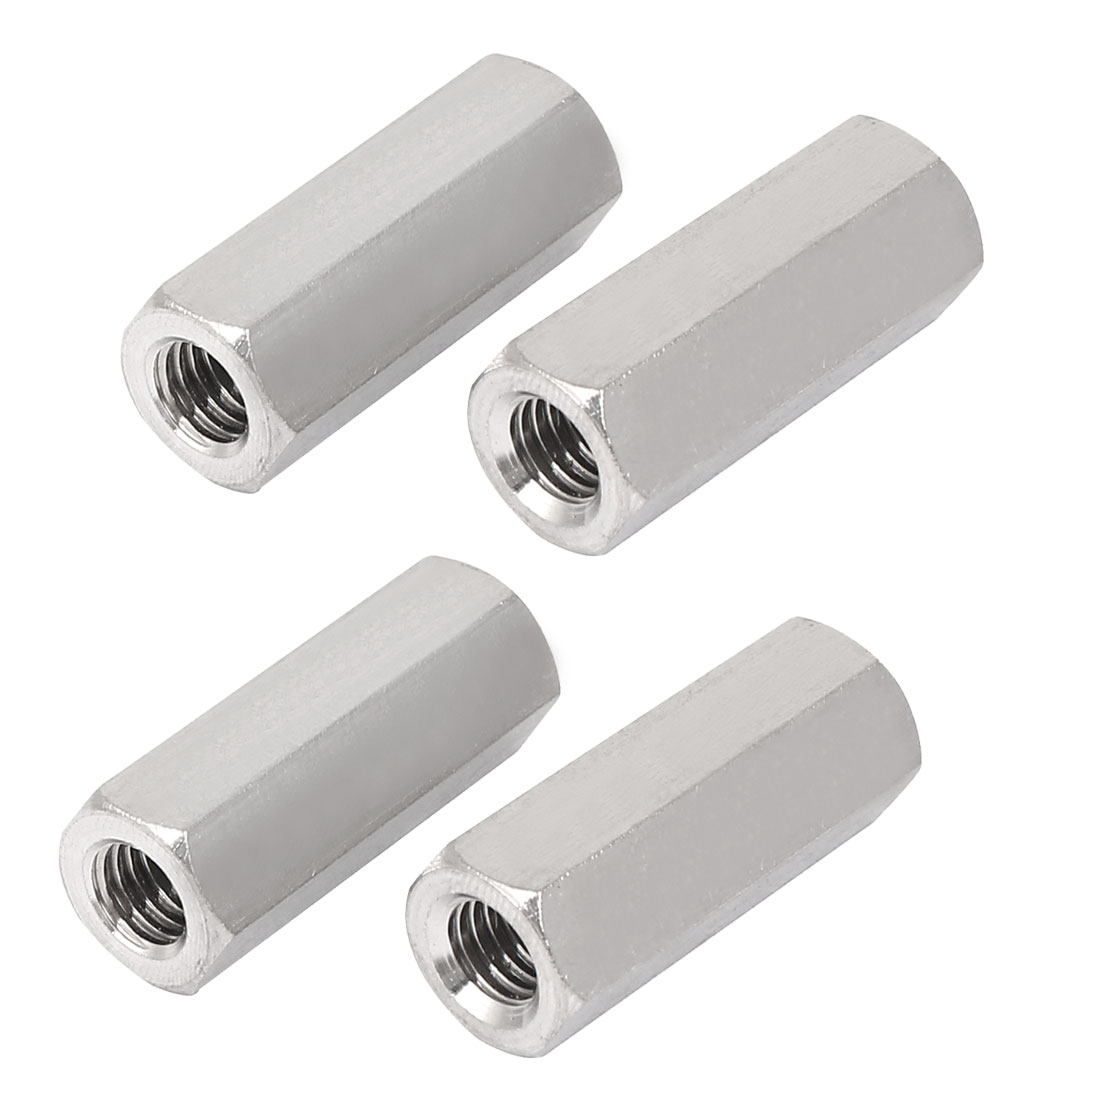 M8x35mm Stainless Steel Threaded Bar Rod Studding Hex Connector Deep Nut 4pcs